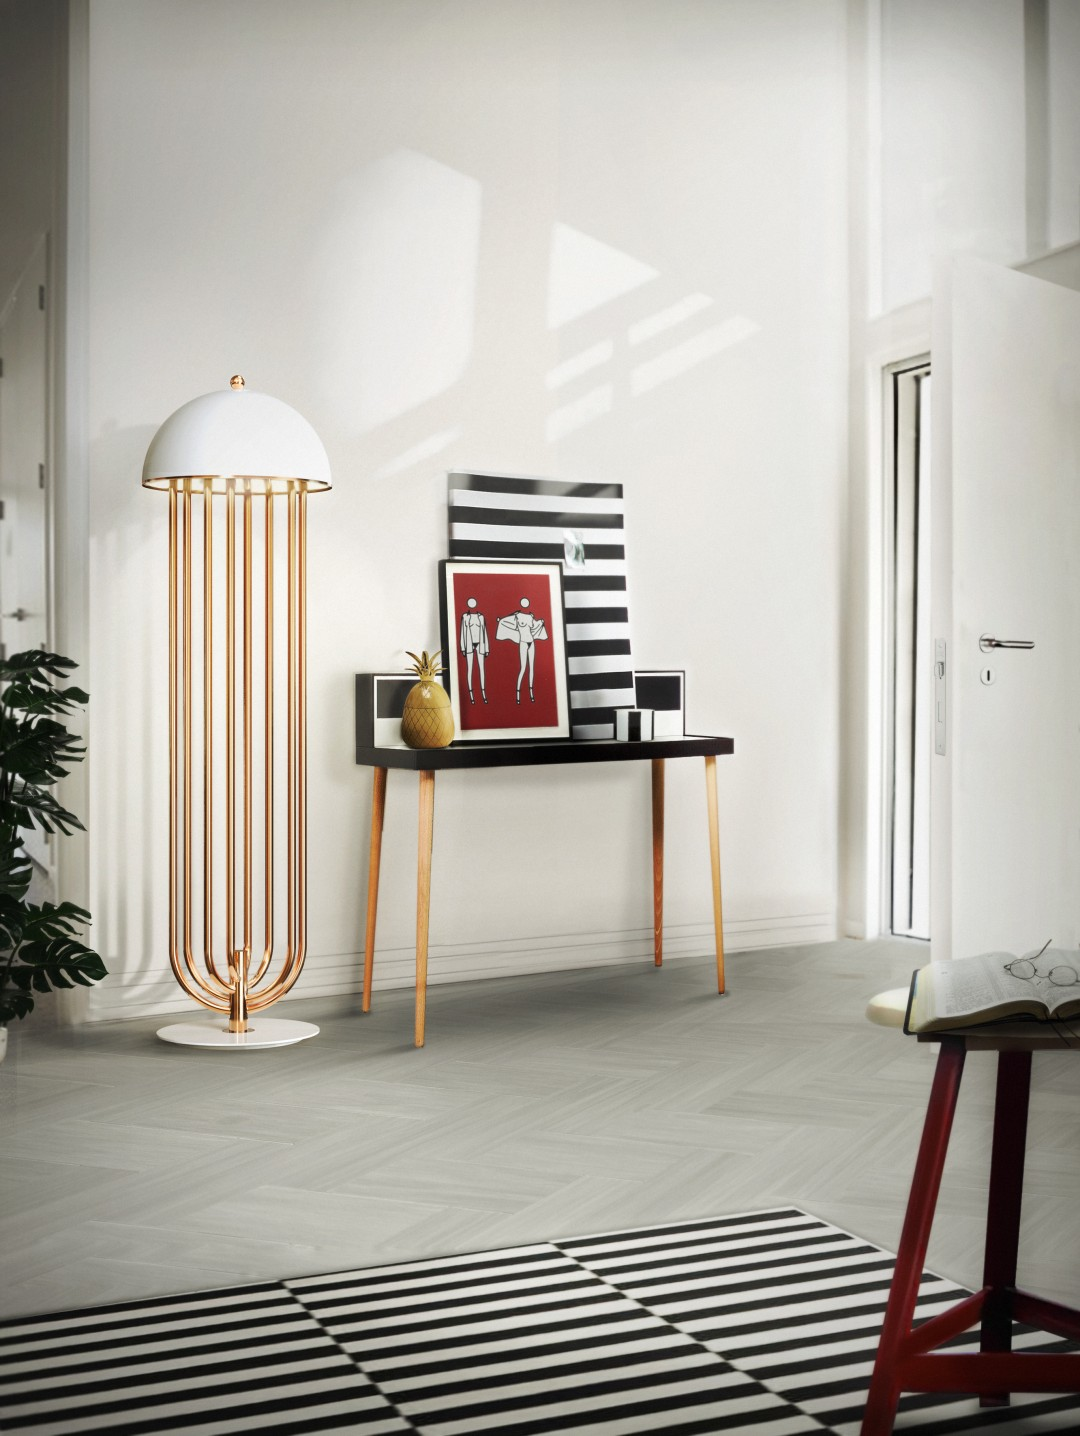 floor samples floor samples Get Your Own Floor Lamp For Your Hallway With Floor Samples! turner floor ambience 02 HR3a58b6b0523540fae4643340ecd57846